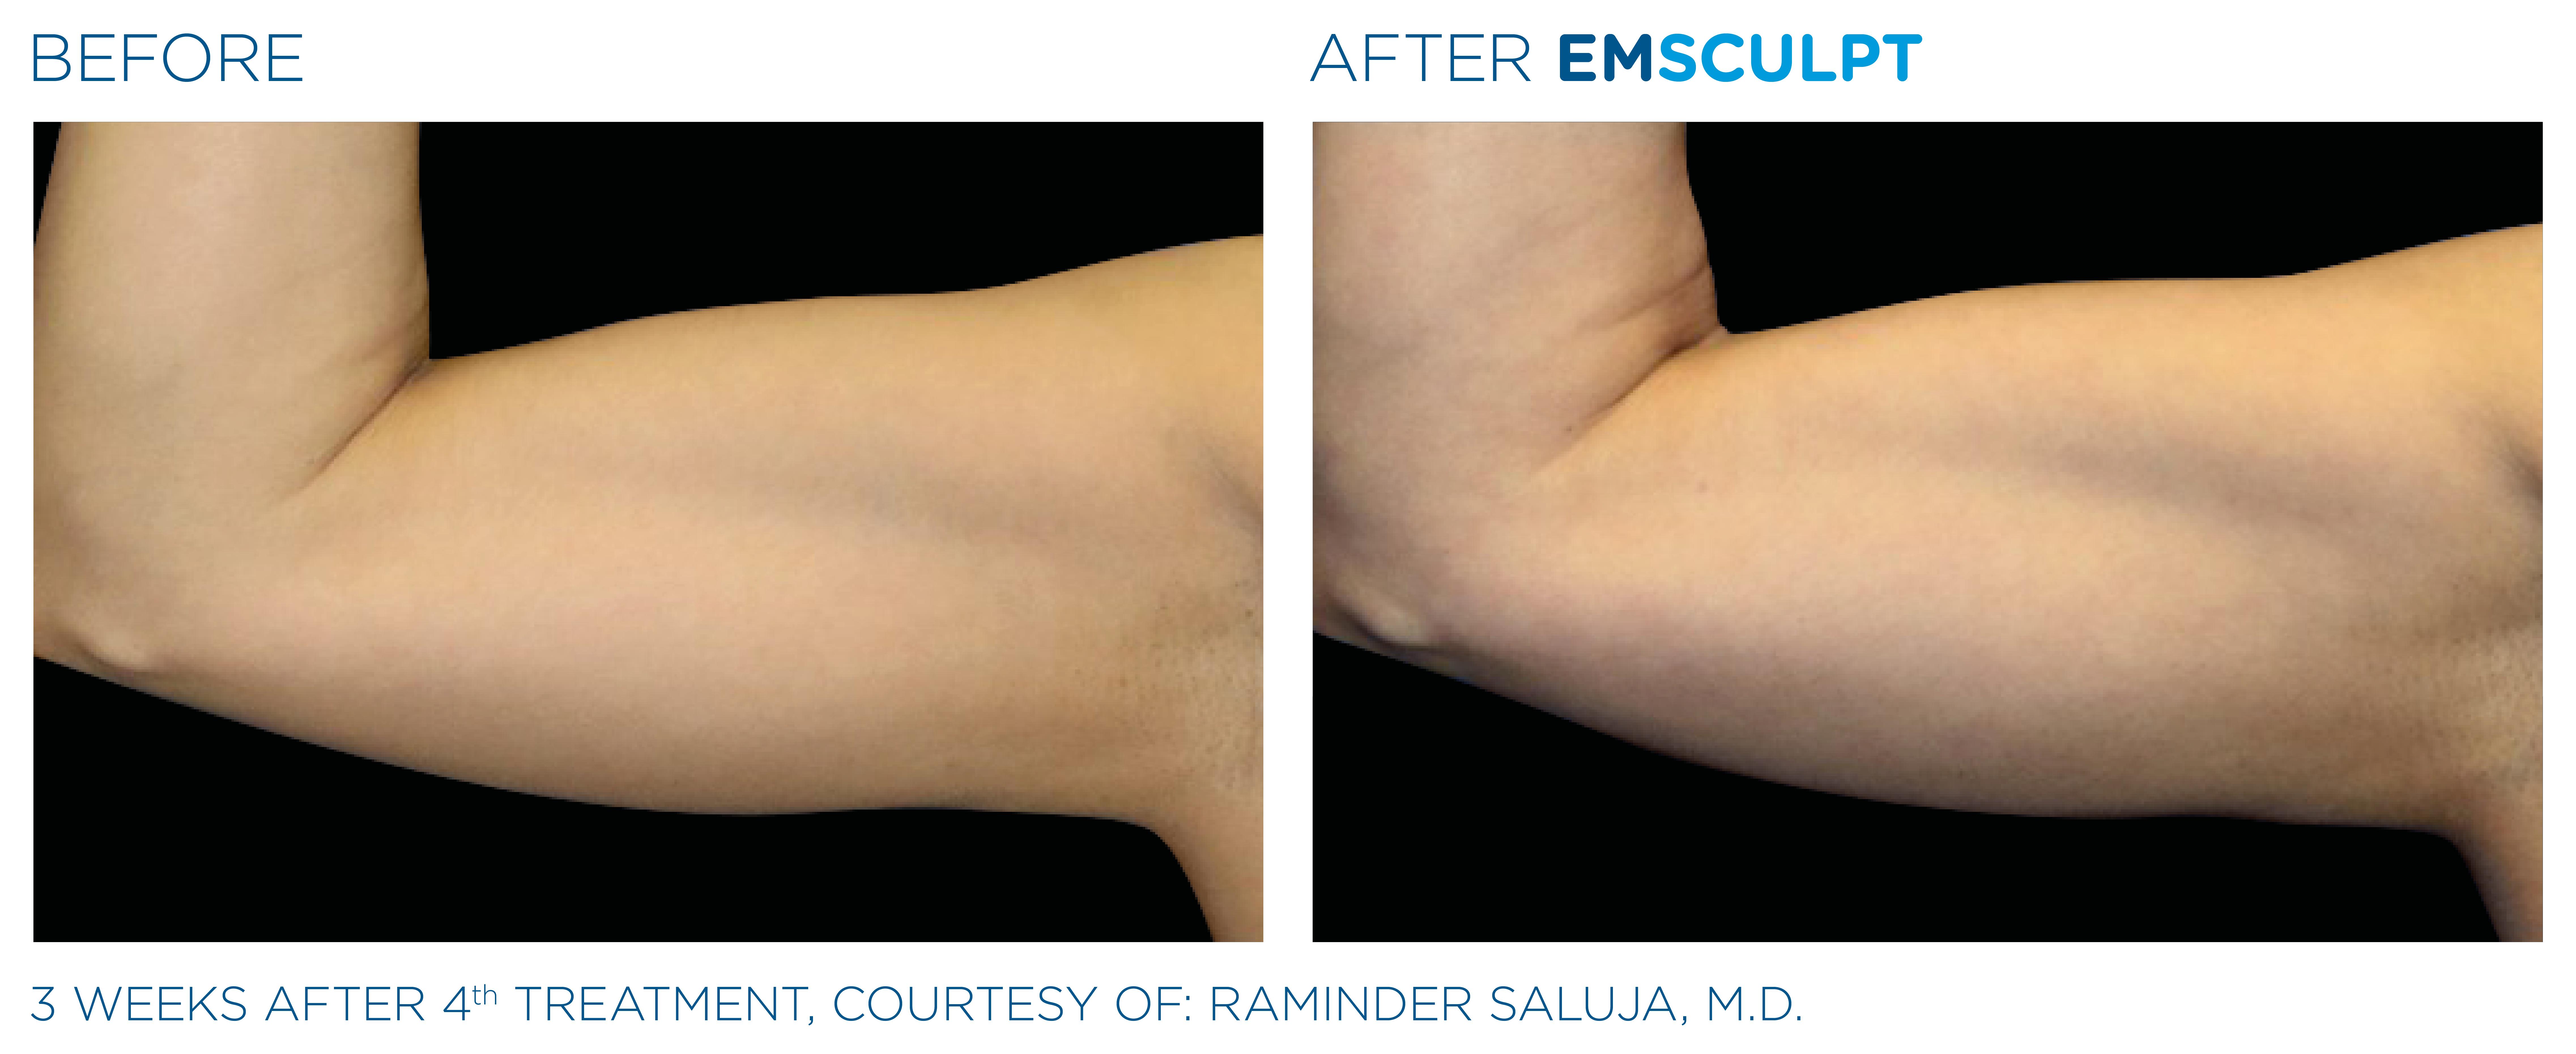 Increase Arm Strength with EMSCULPT Hampshire aesthetics Clinics